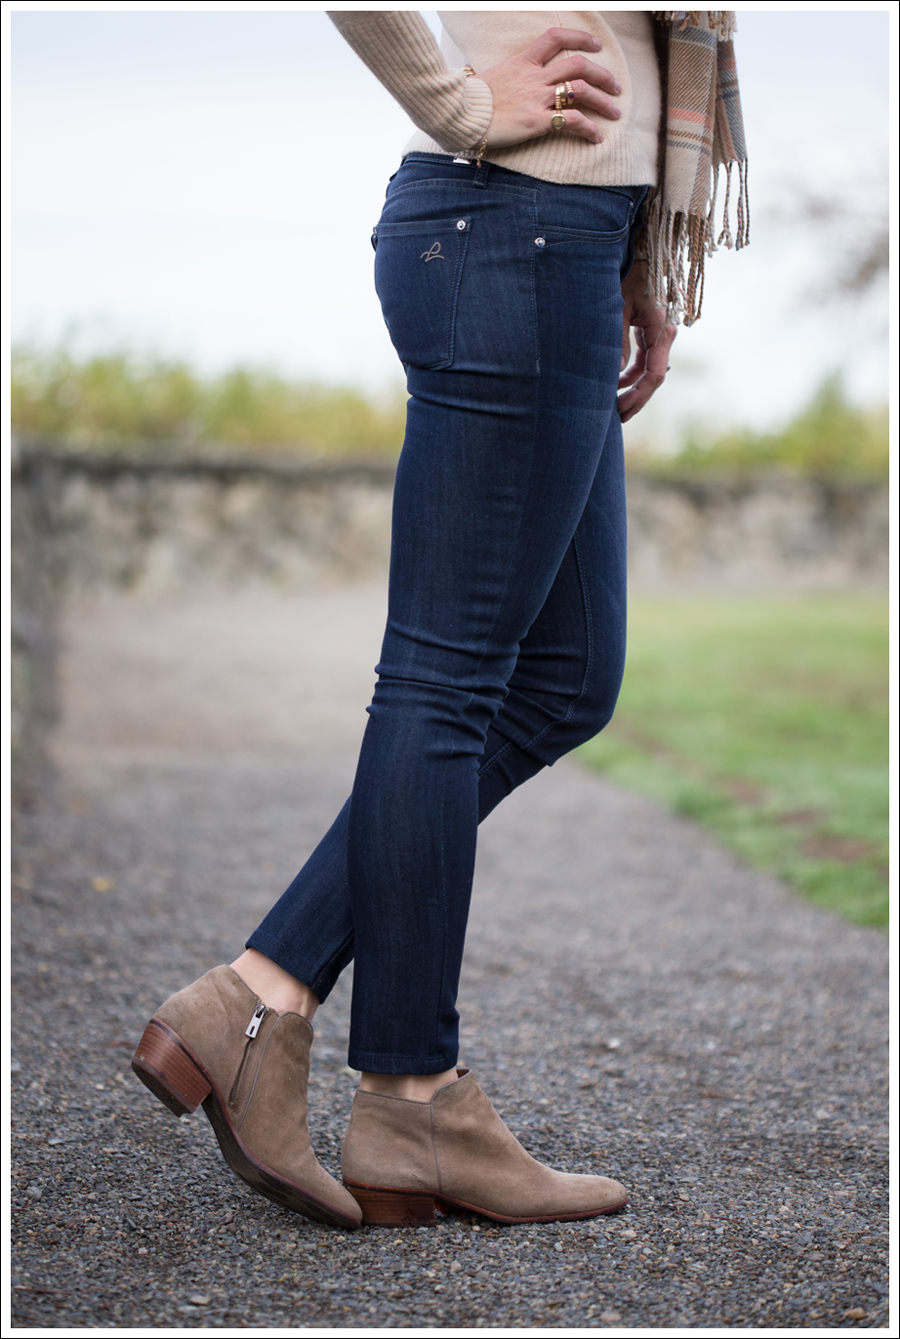 23323982c0bba0 1 Blog Vintage Brown Plaid Scarf Autumn Cashmere Sweater DL1961 Emma Bloom  Sam  Sam Edelman Petty Boots in putty ...